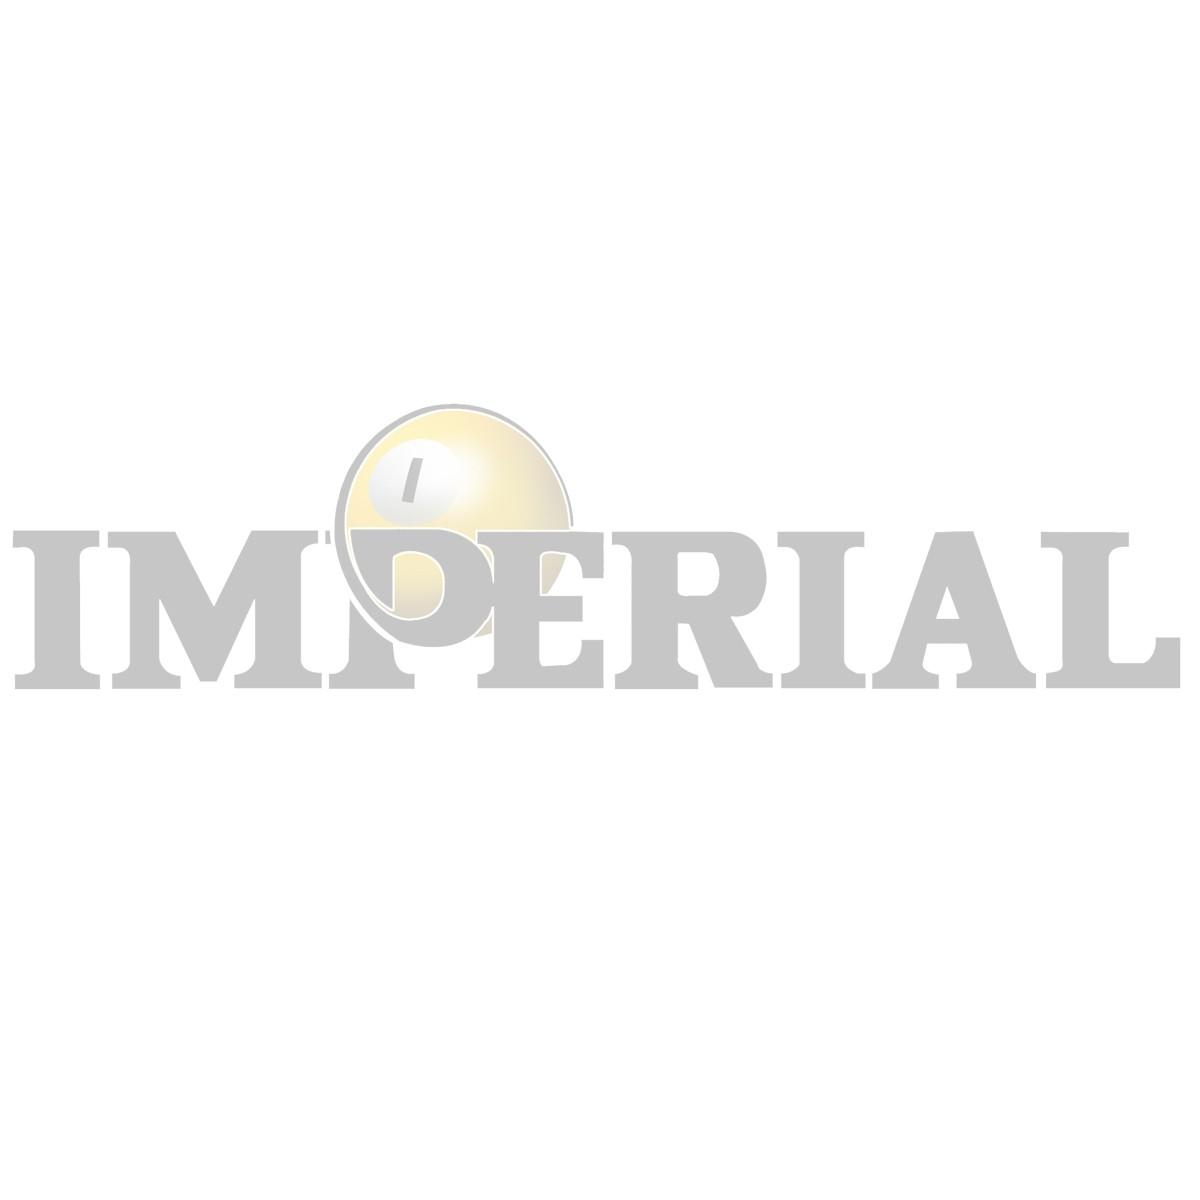 Louisiana State University Home vs. Away Billiard Ball Set